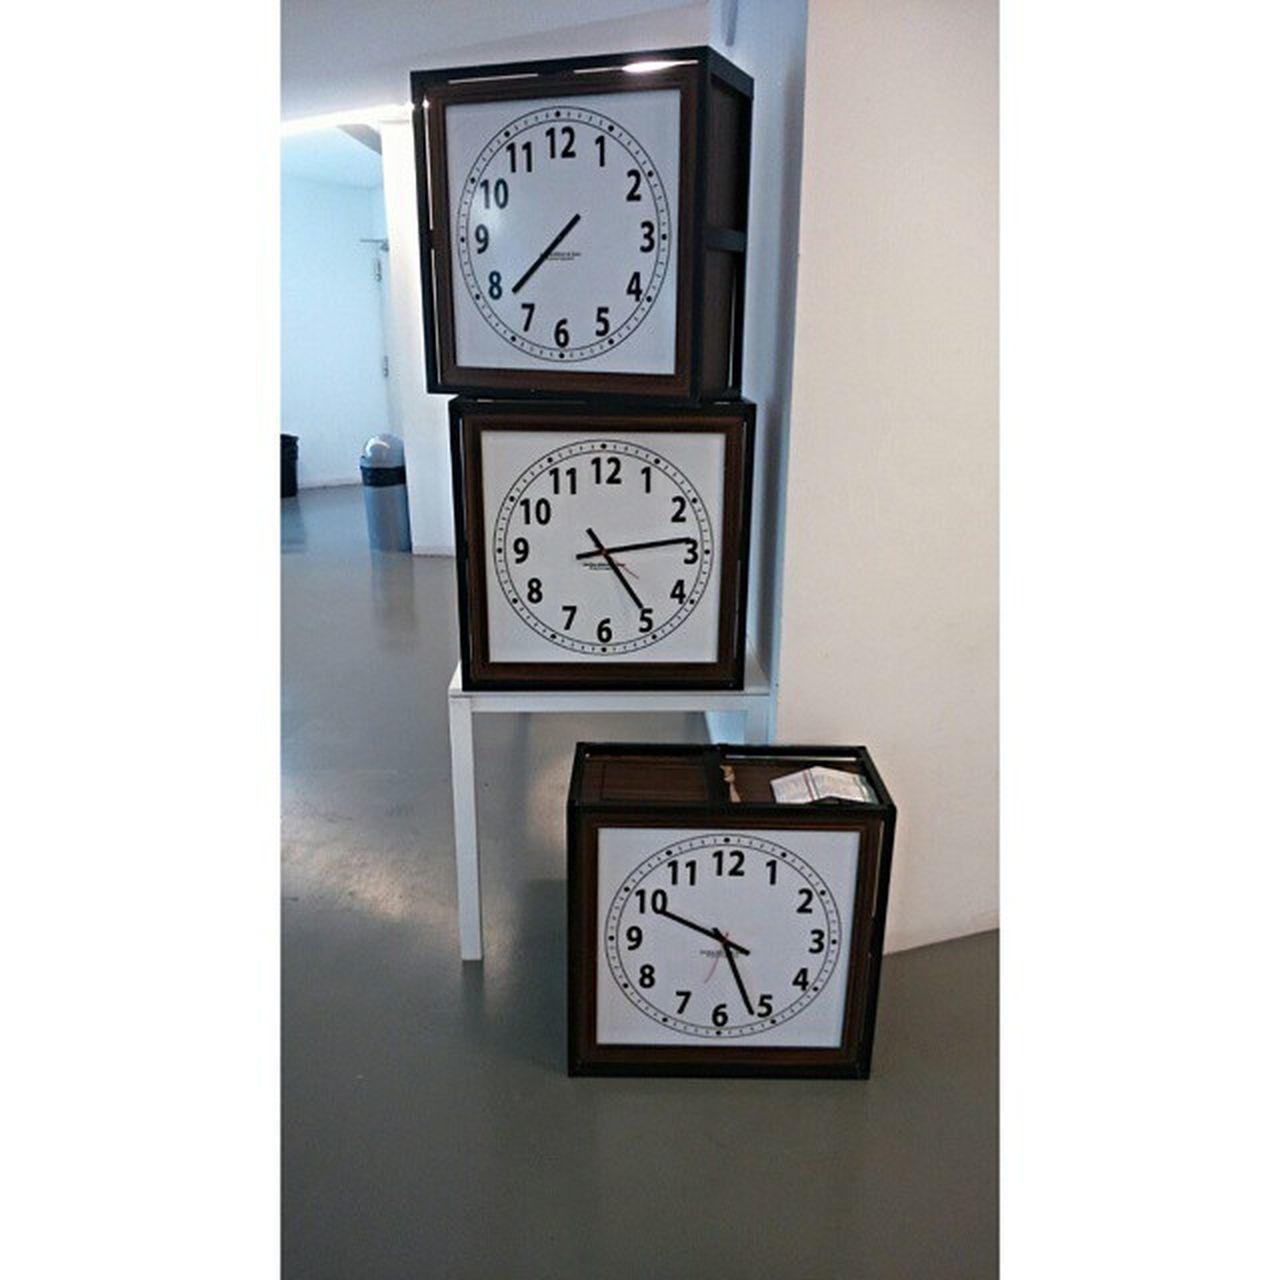 Time Flies Take Advantage Of it andenjoy